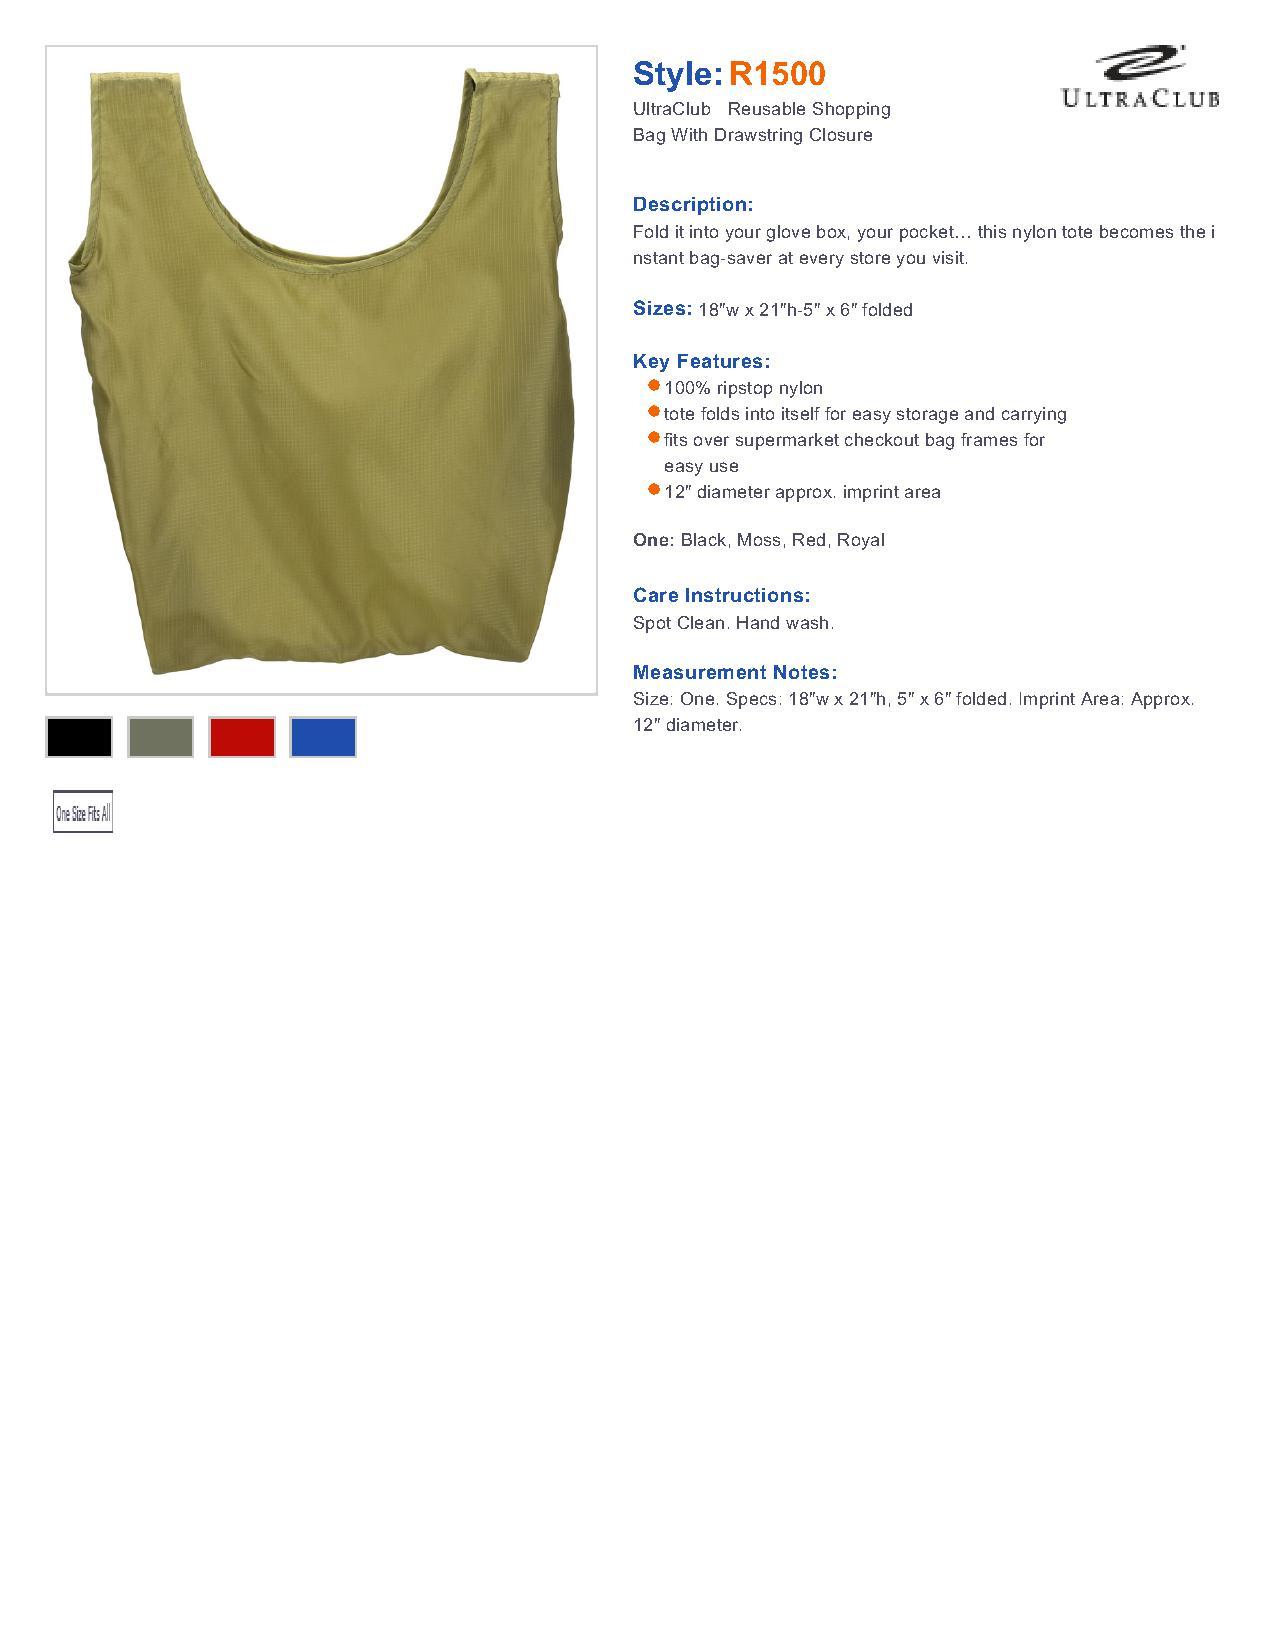 9a843f5fb UltraClub R1500-Reusable Shopping Bag With Drawstring Closure $3.28 ...